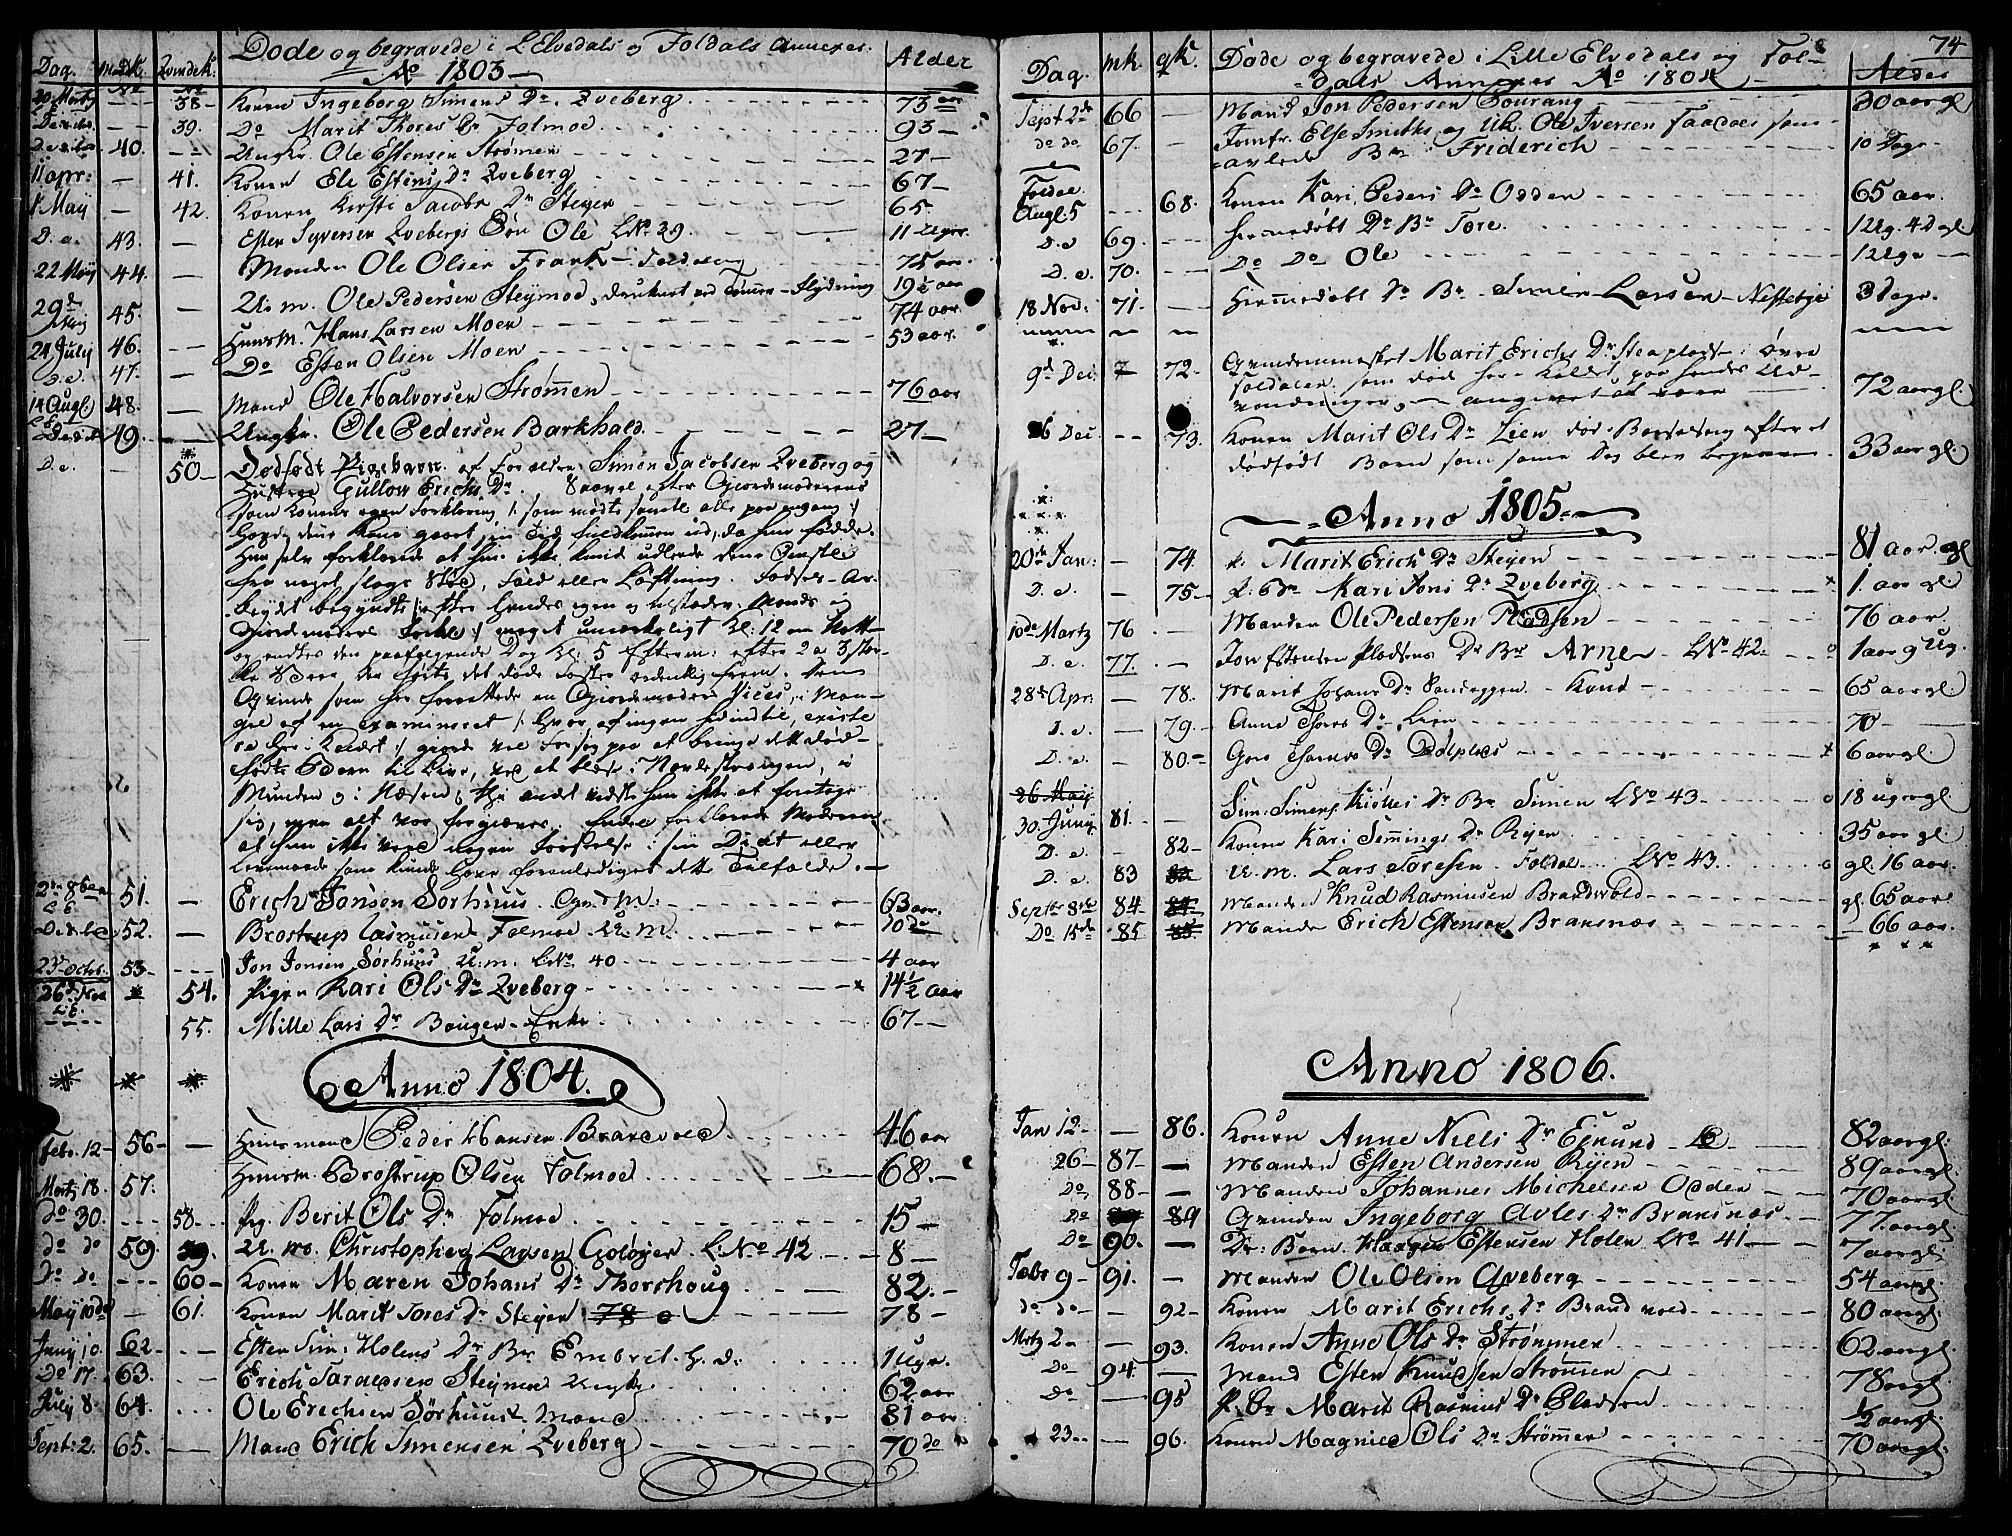 SAH, Tynset prestekontor, Ministerialbok nr. 16, 1801-1814, s. 74